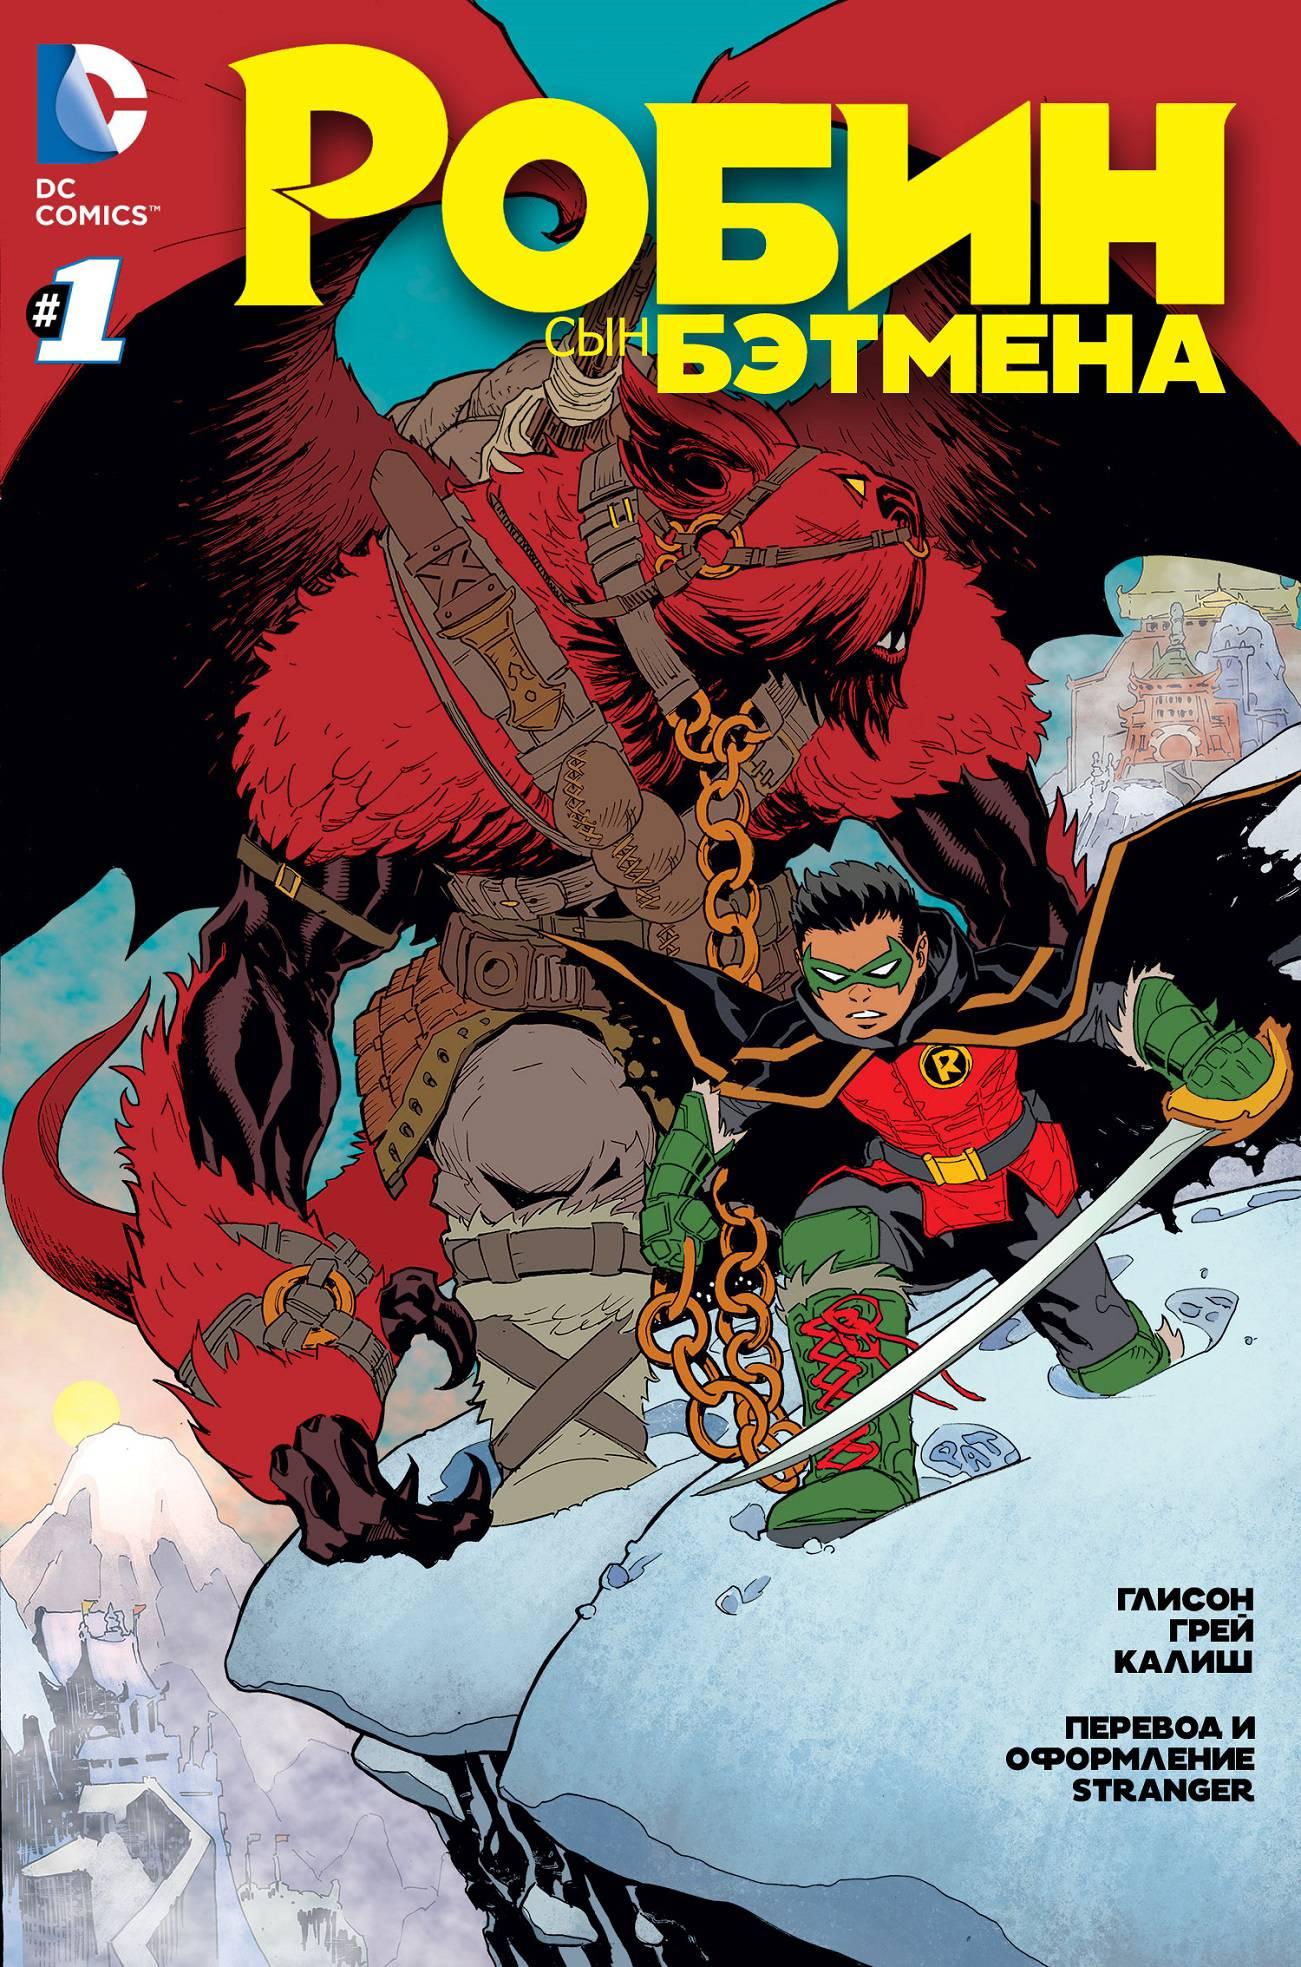 Робин: Сын Бэтмена №1 онлайн